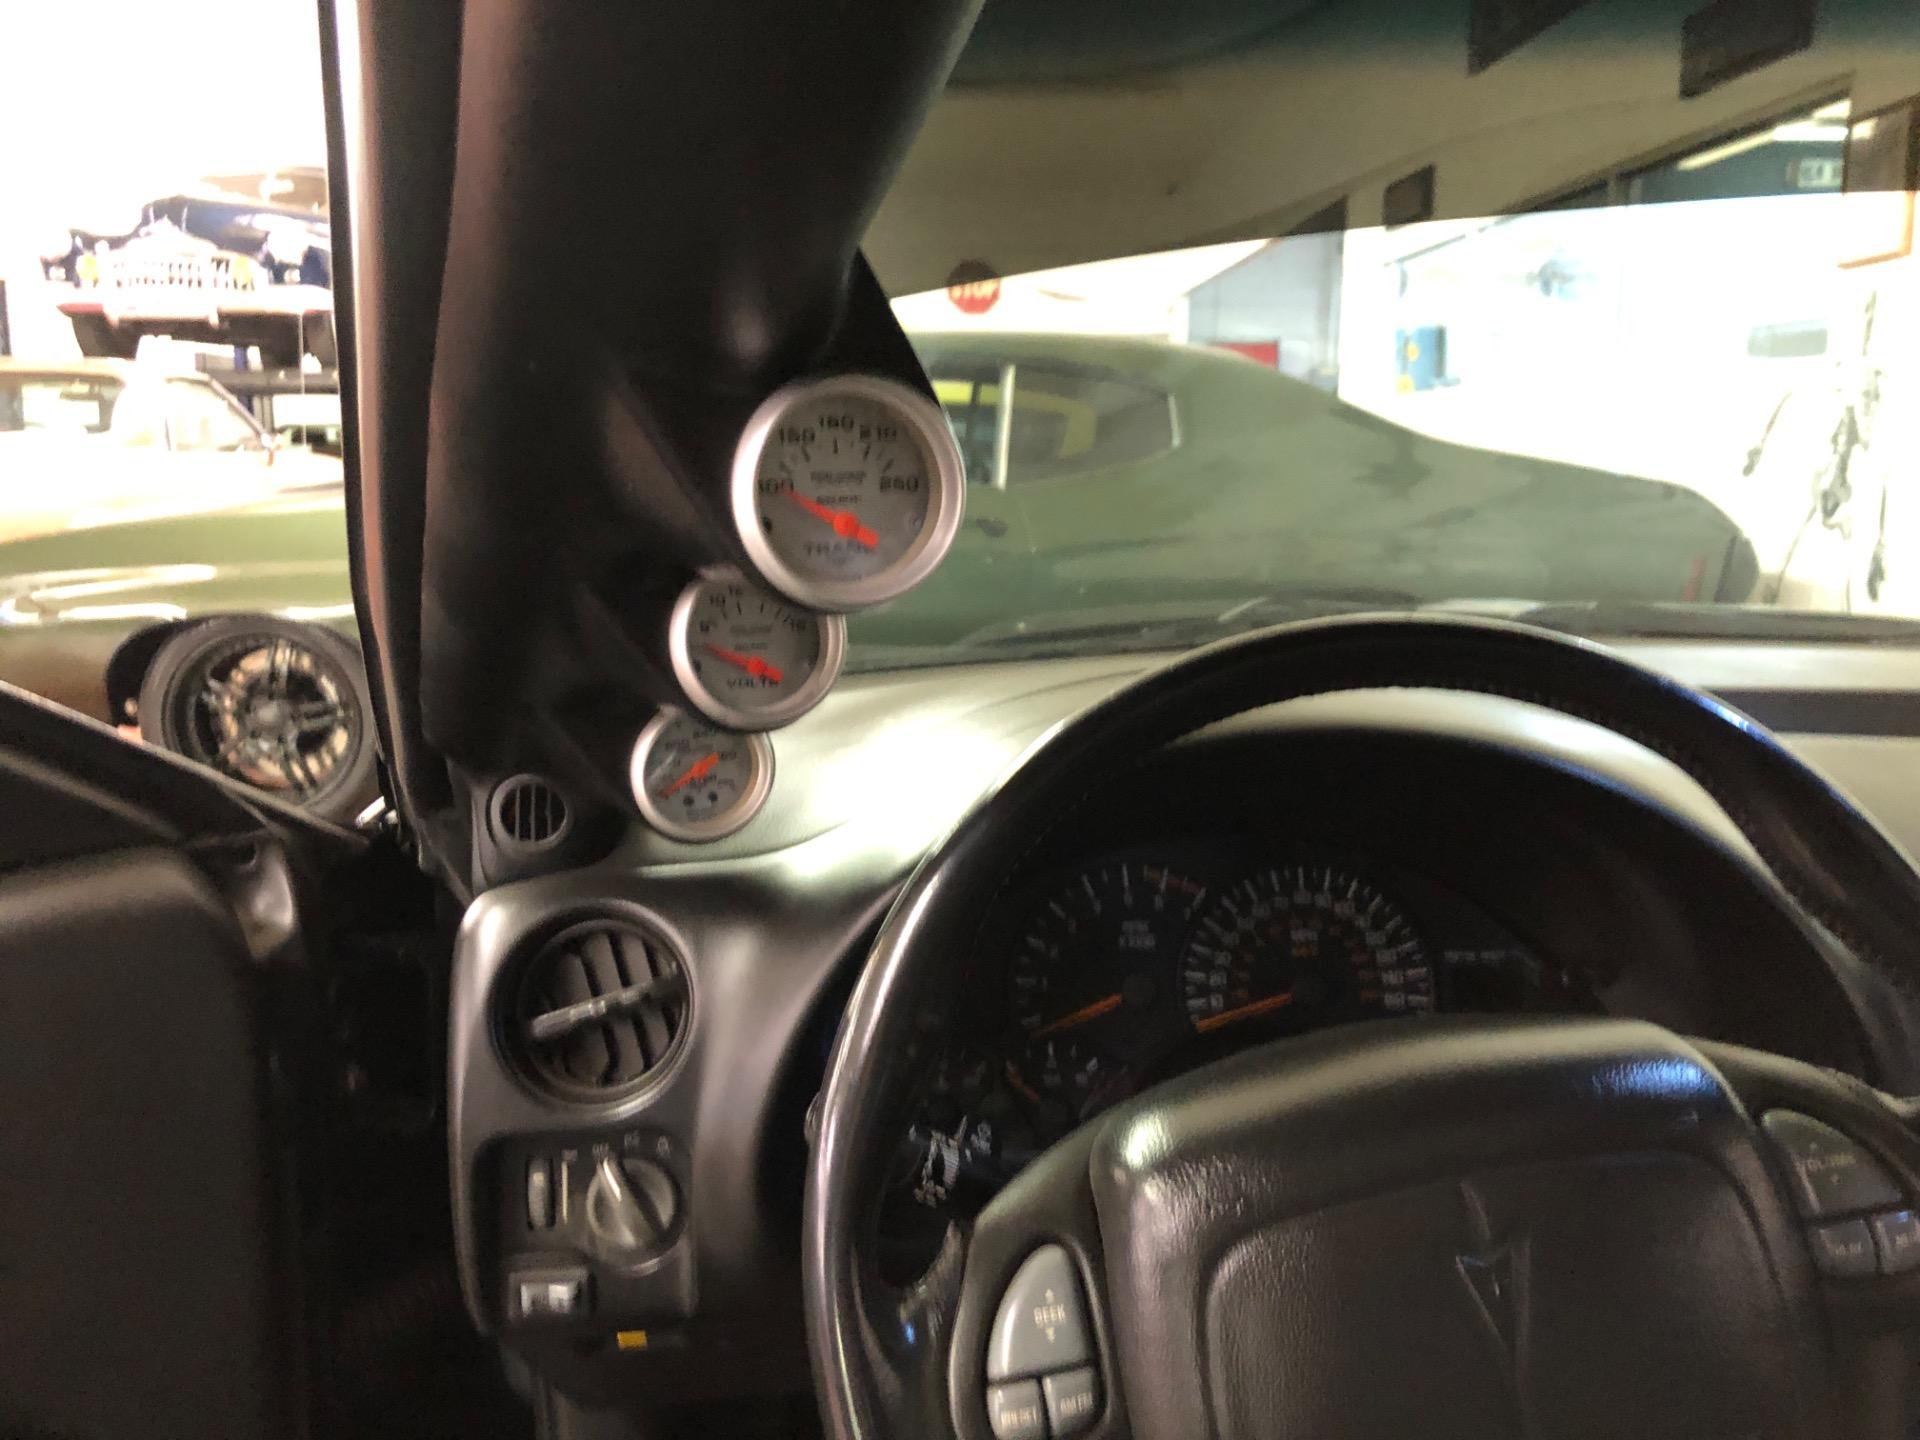 Used 2002 Pontiac Firebird - WS6 TRANS AM - SHOW QUALITY CUSTOM PAINT - SEE VIDEO | Mundelein, IL